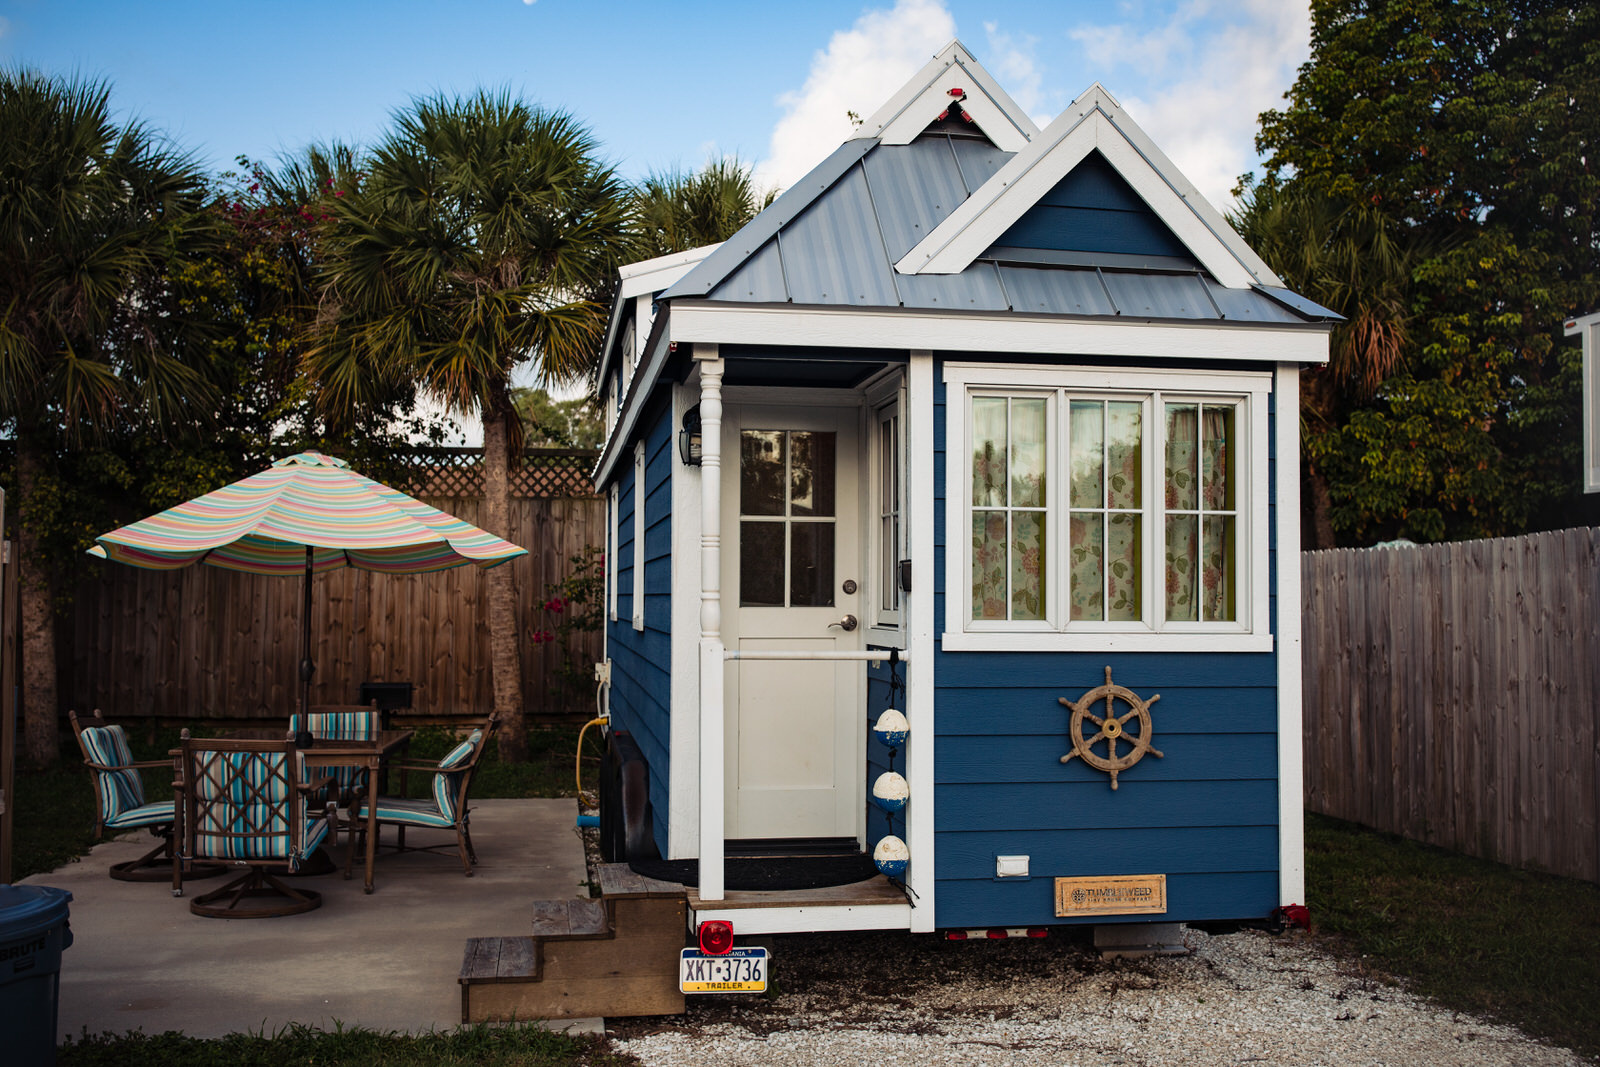 siesta-key-florida-tiny-house-photo-vacation-beach-nature-macro-5.jpg